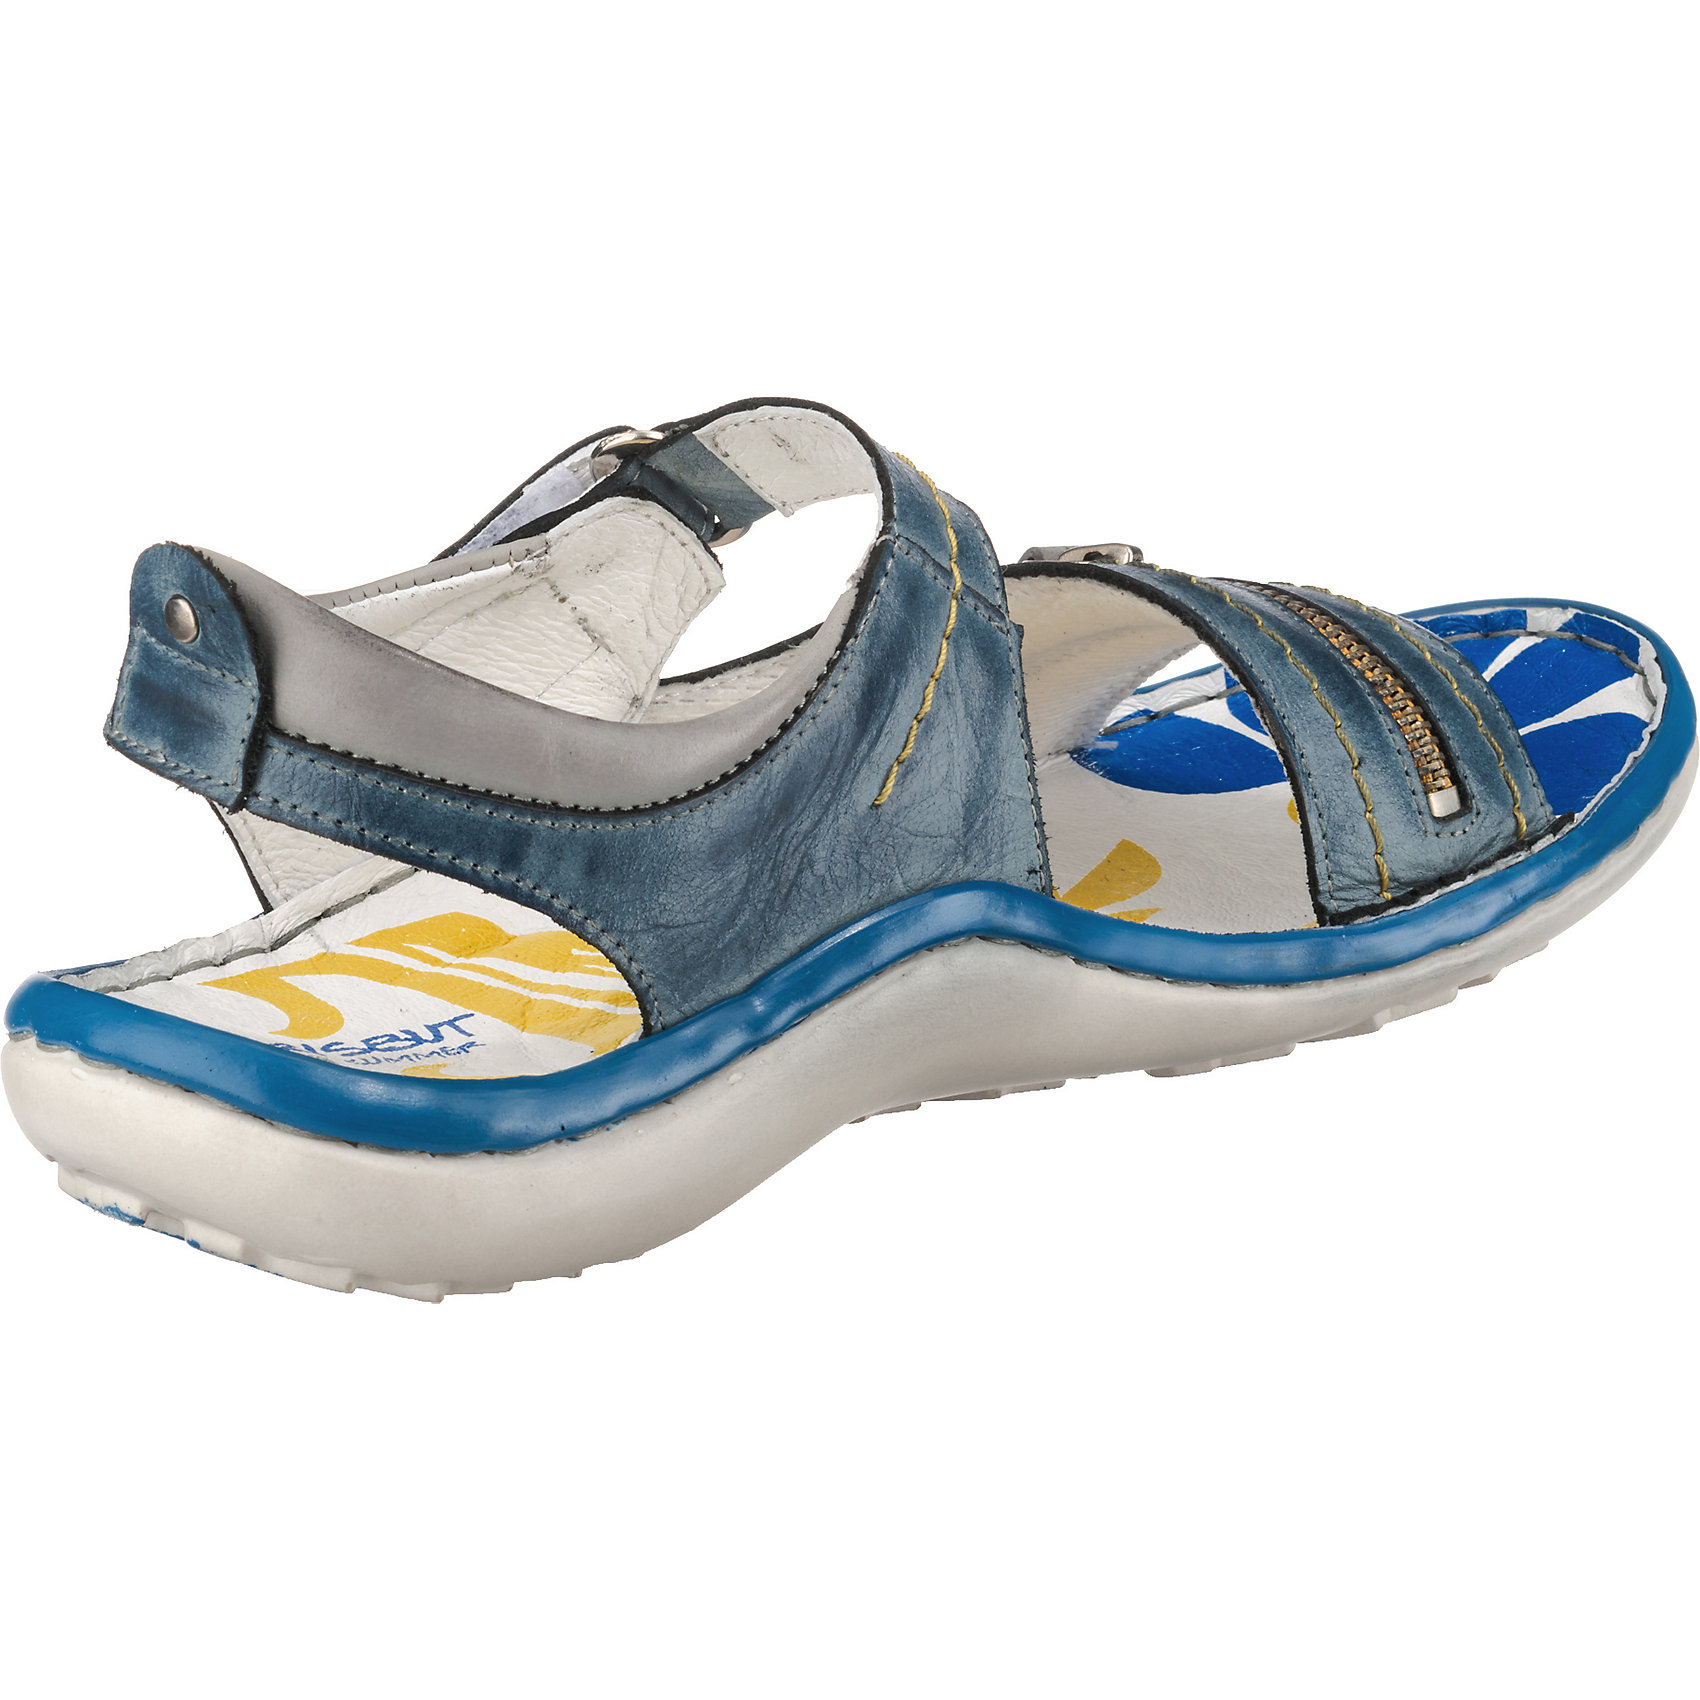 Neu Krisbut Sandaletten blau offwhite 5774425